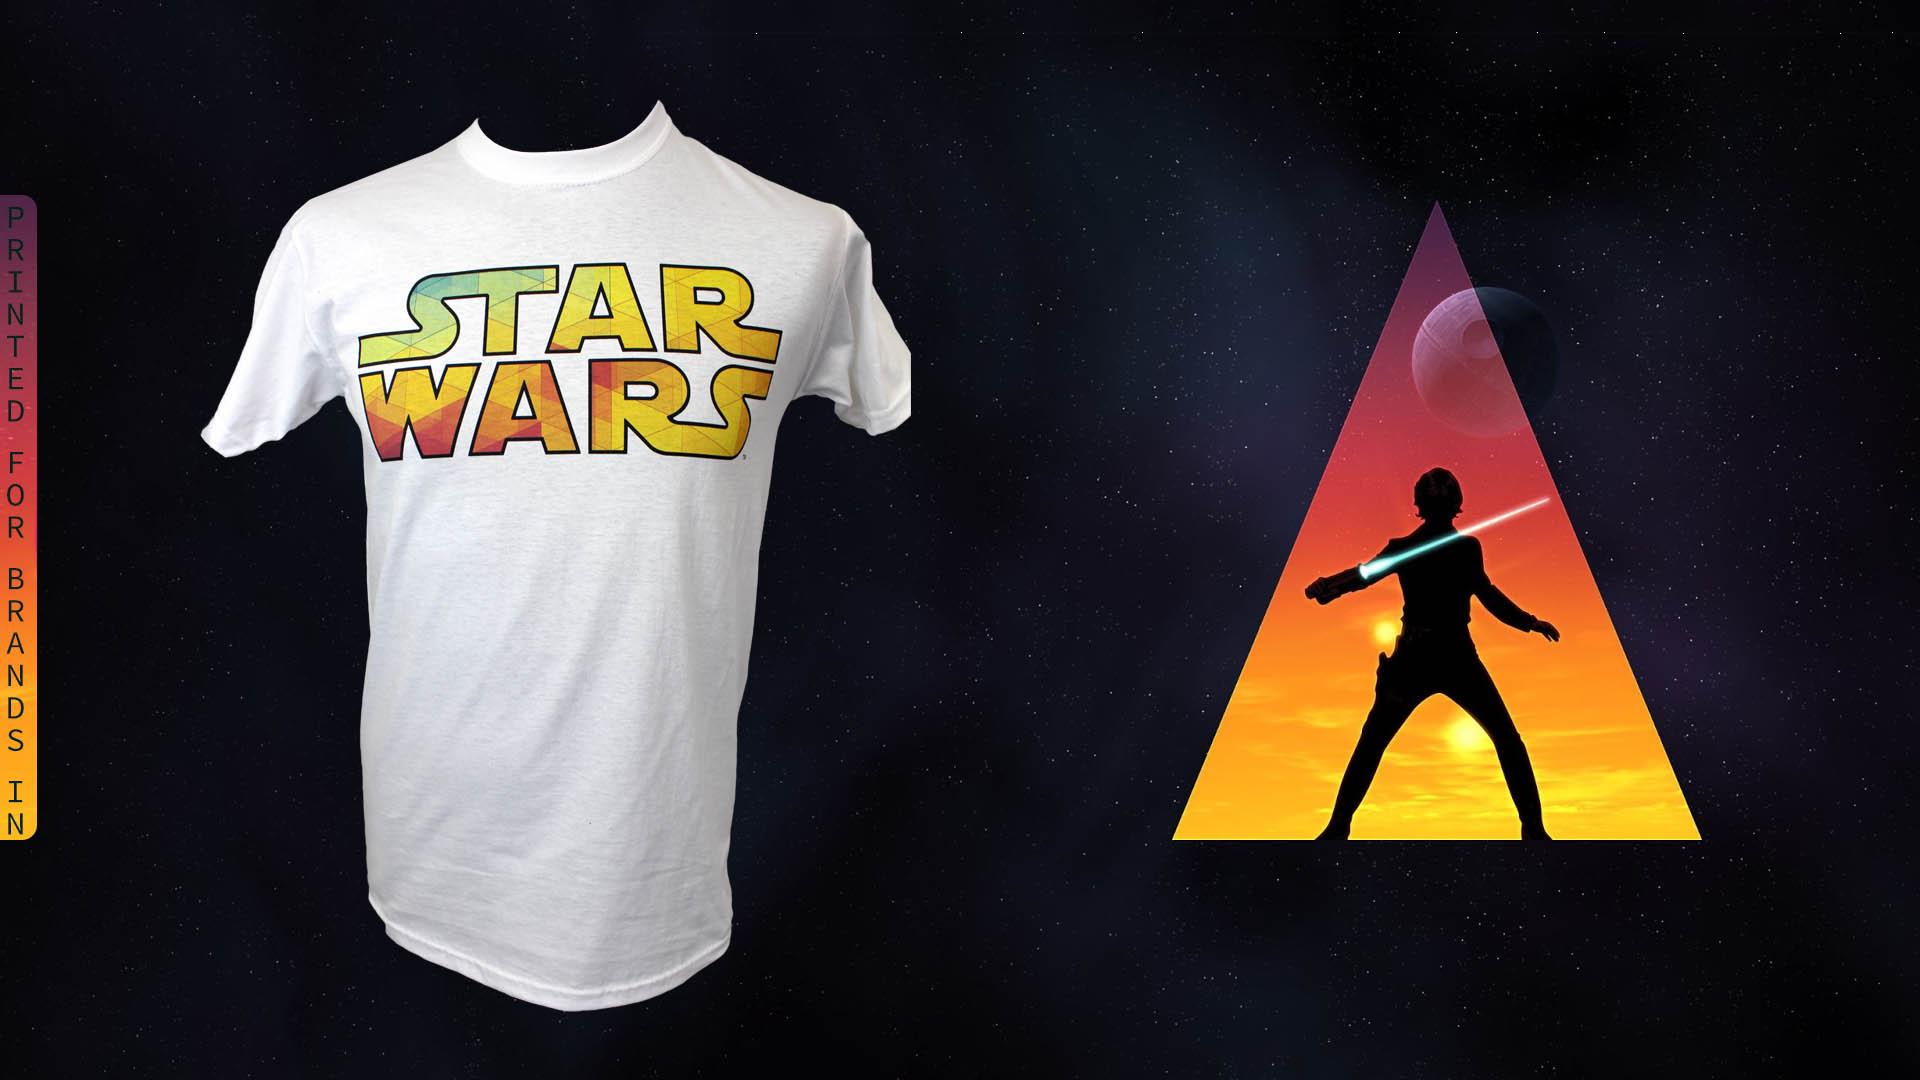 Dtg printing star wars t shirt printing fresh air for Dtg t shirt printing company